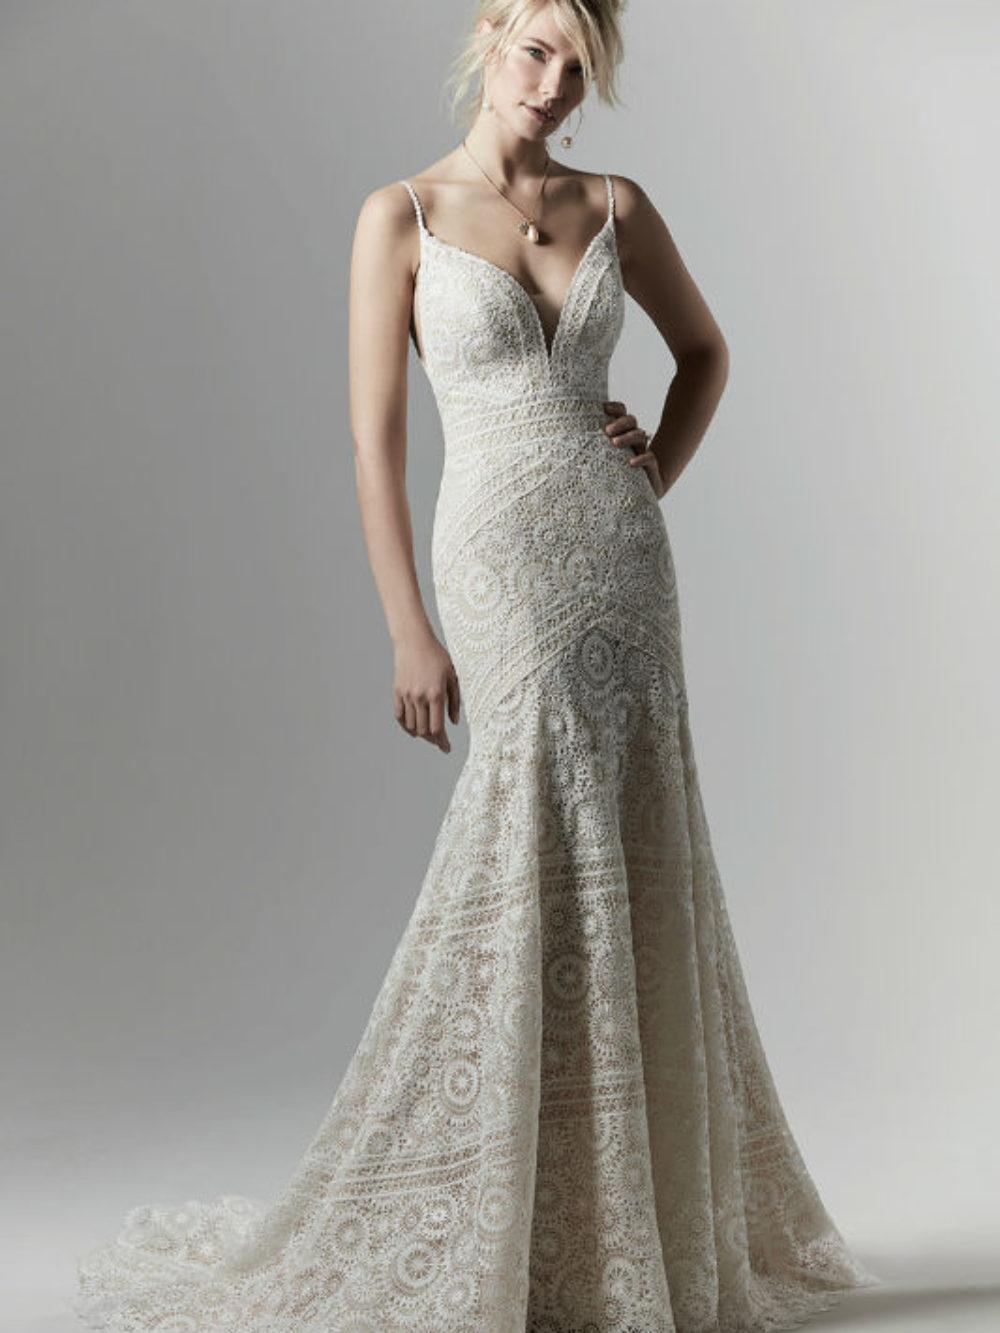 Fielding By Sottero Midgley Maggie Sottero Wedding Dresses Sottero Wedding Dress Wedding Dress Brands